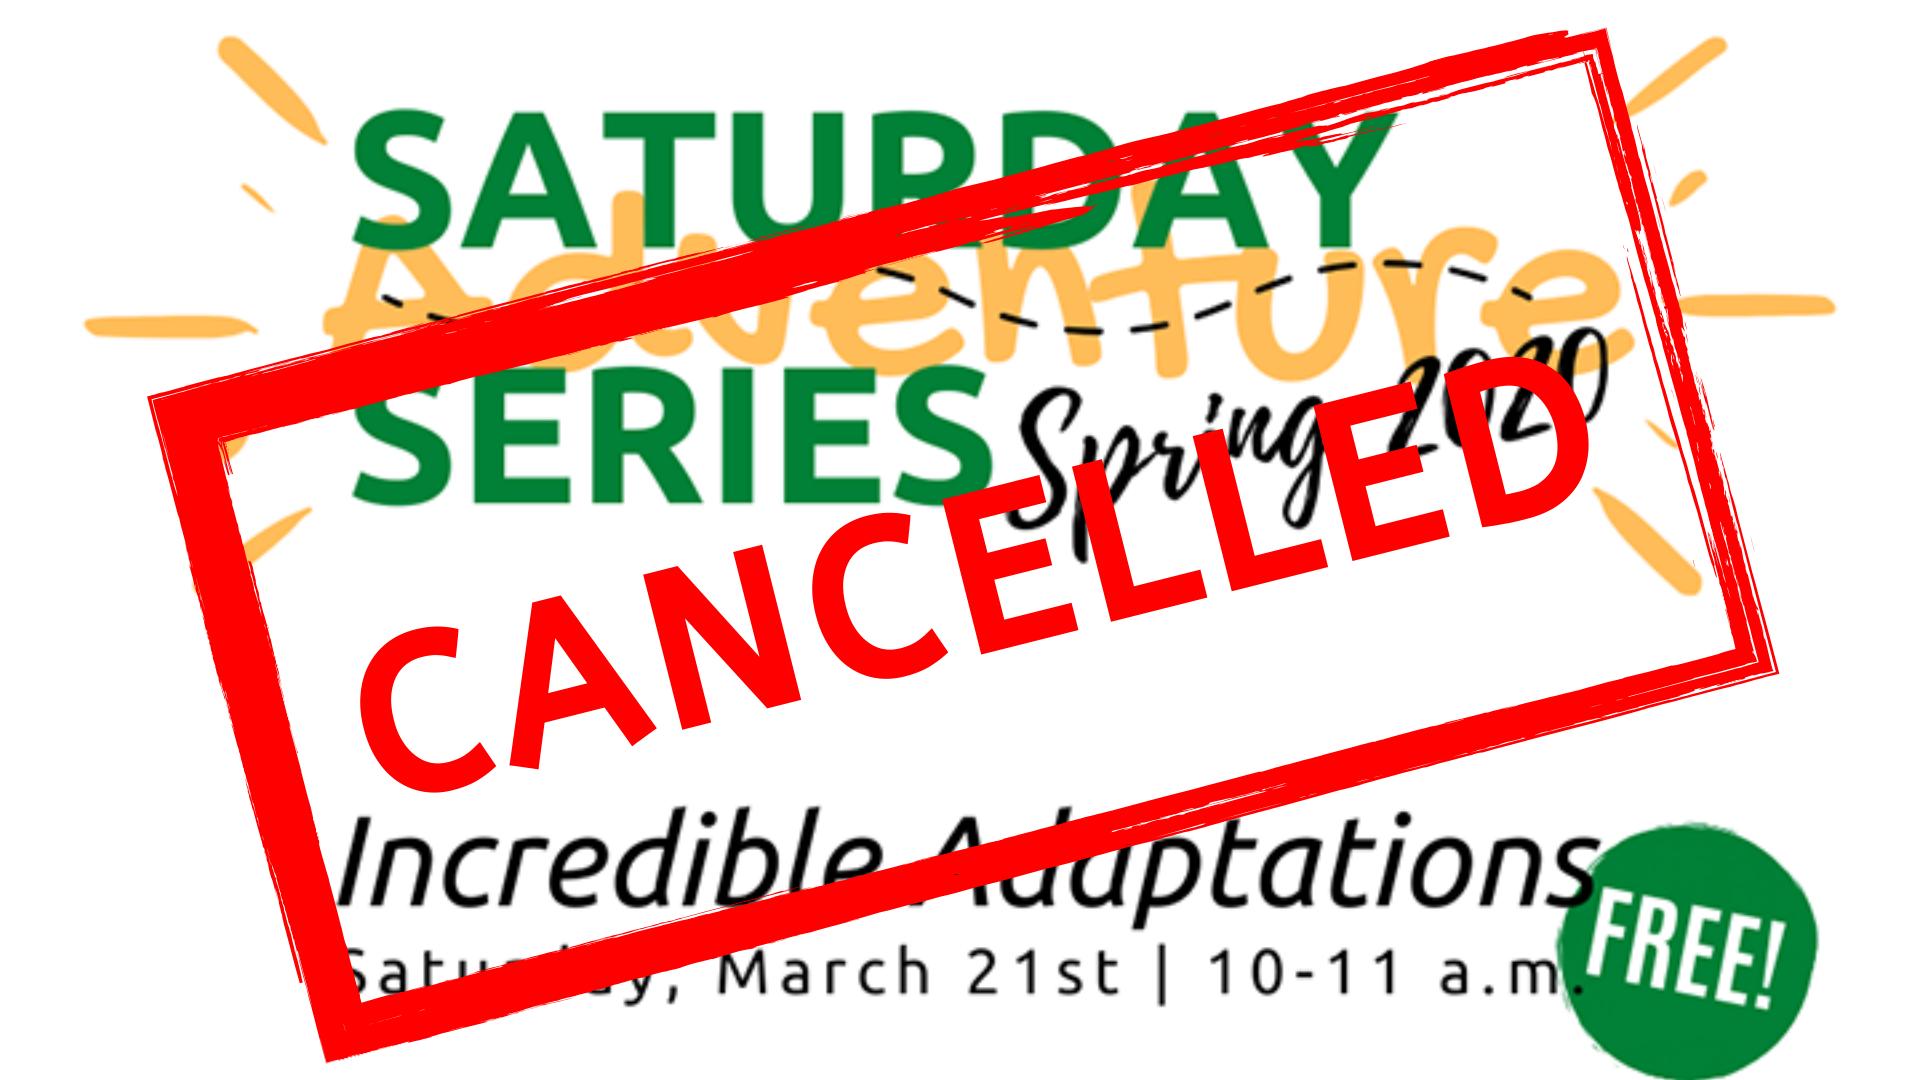 Saturday Adventure Series: Incredible Adaptations